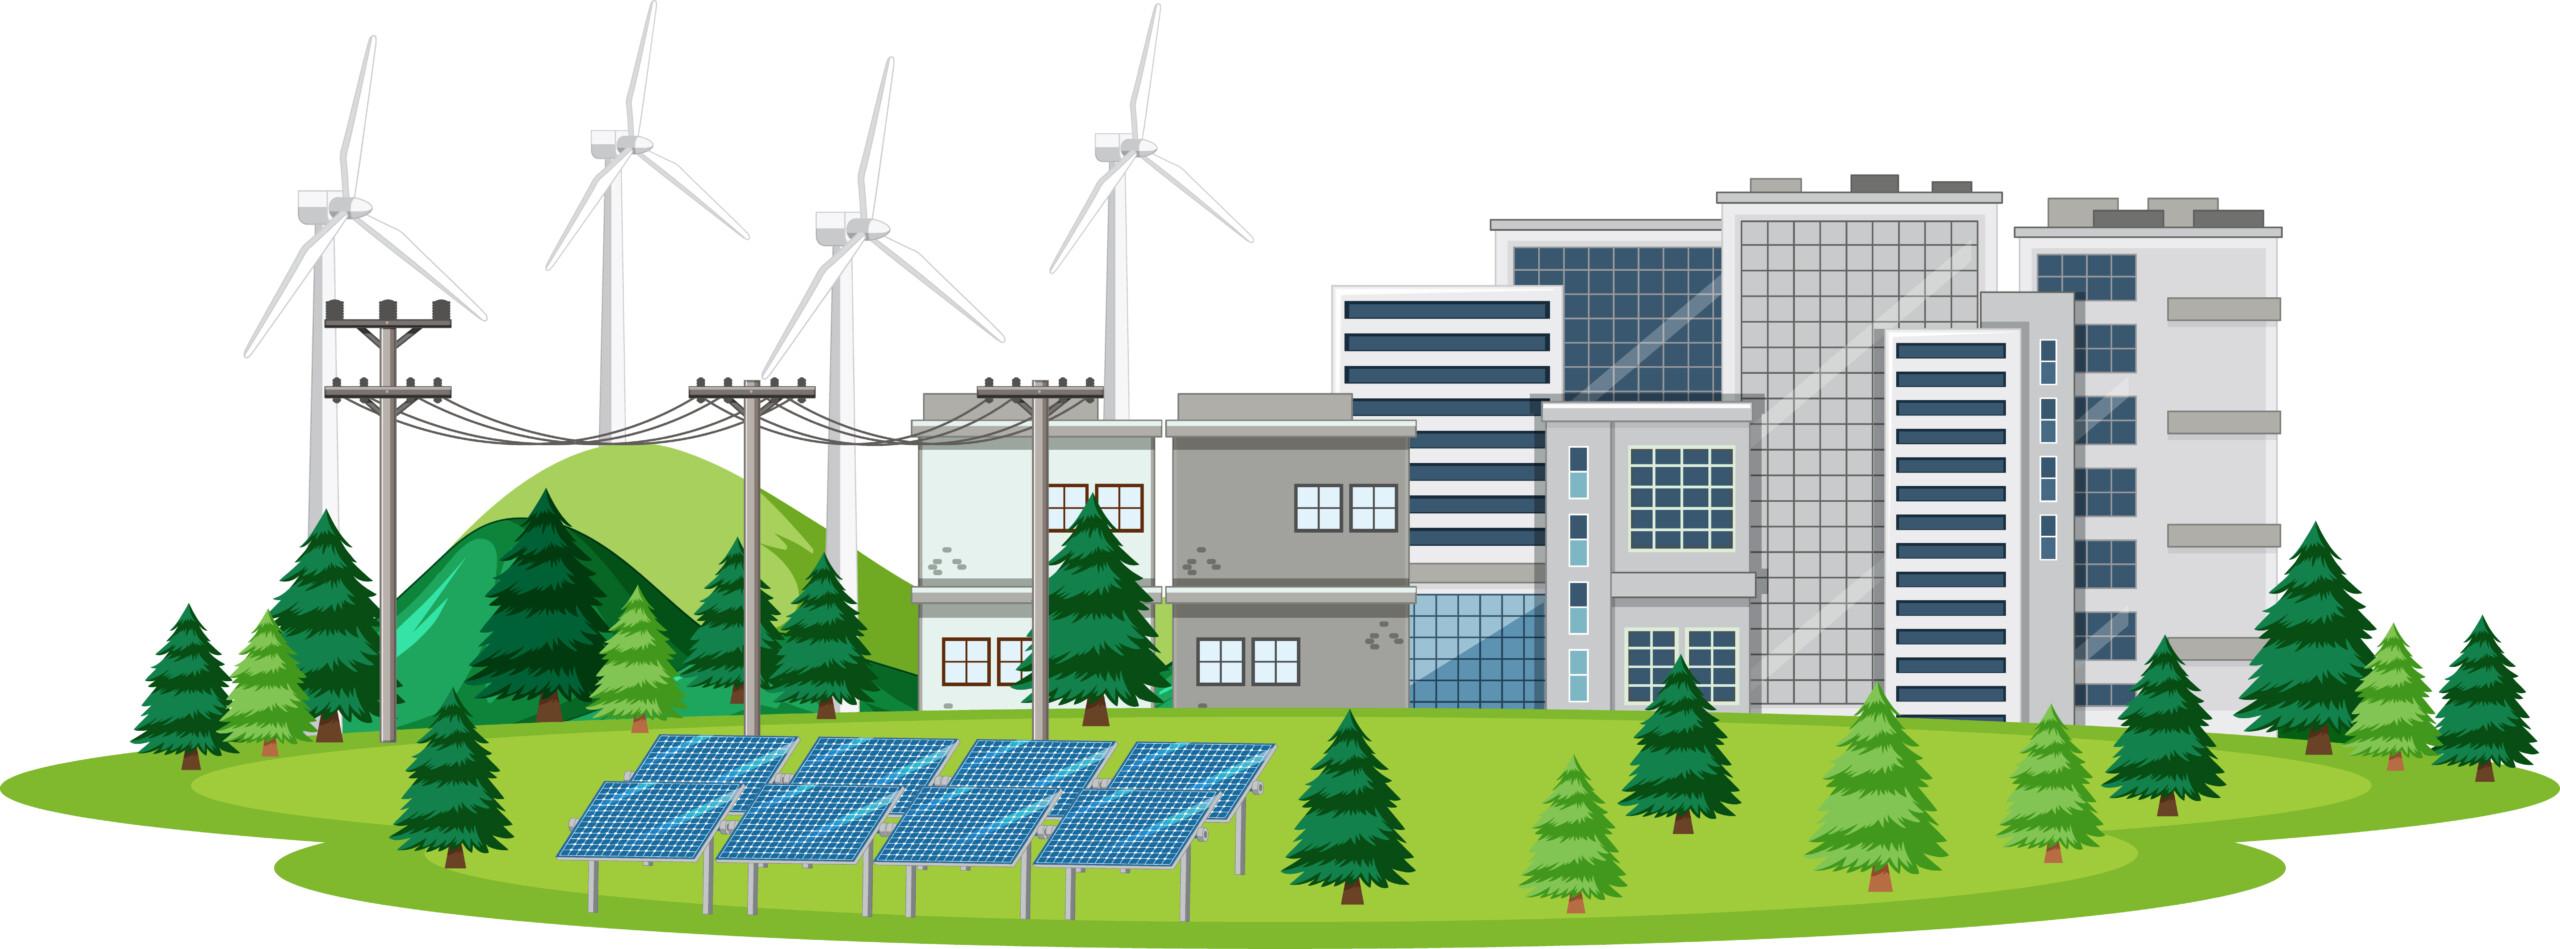 Edificios con energía renovable